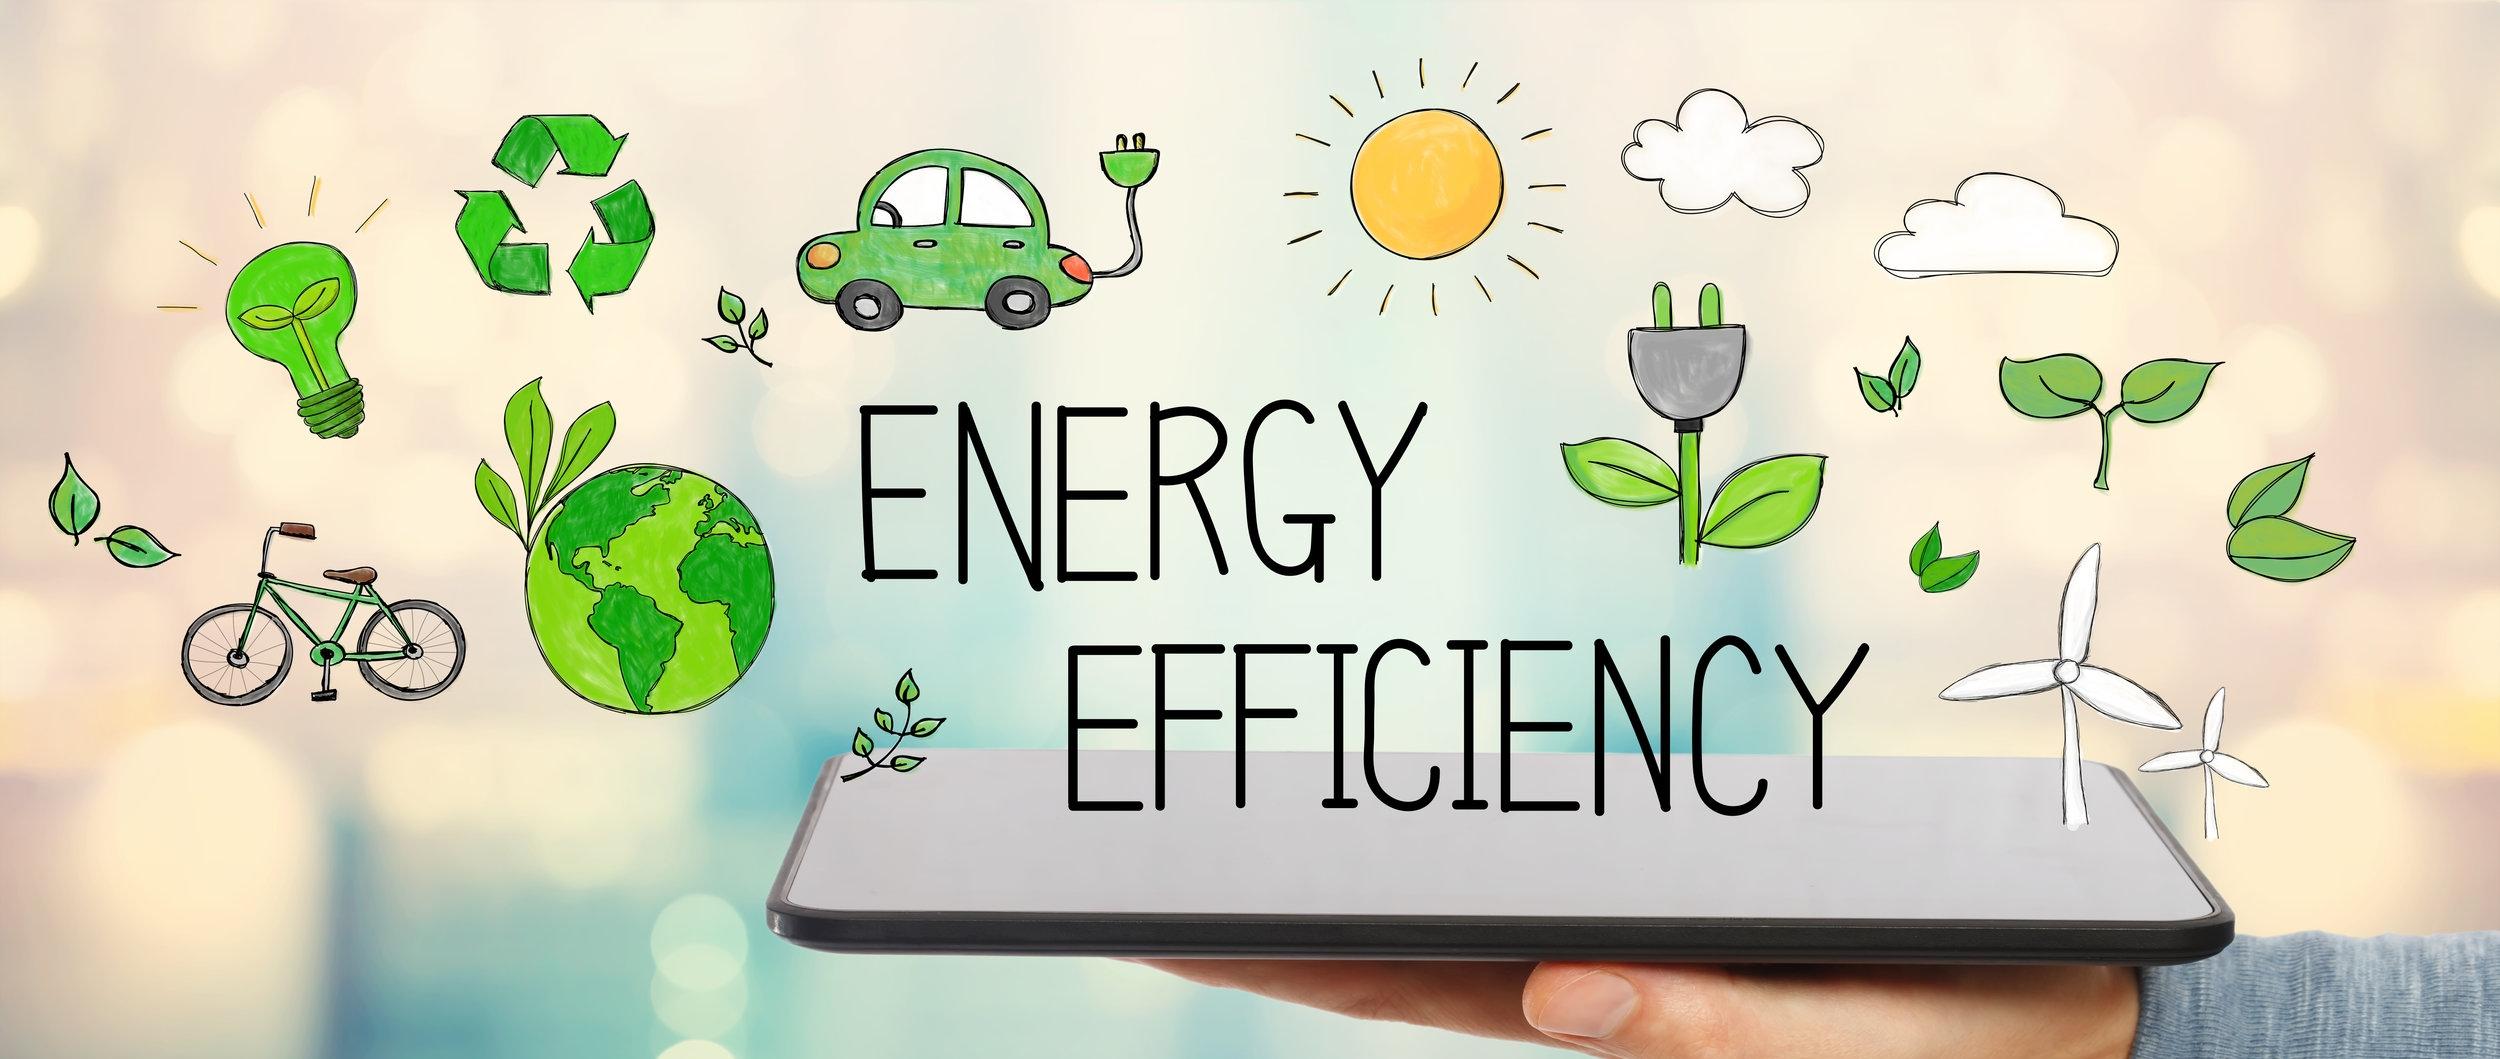 energyefficency.jpeg